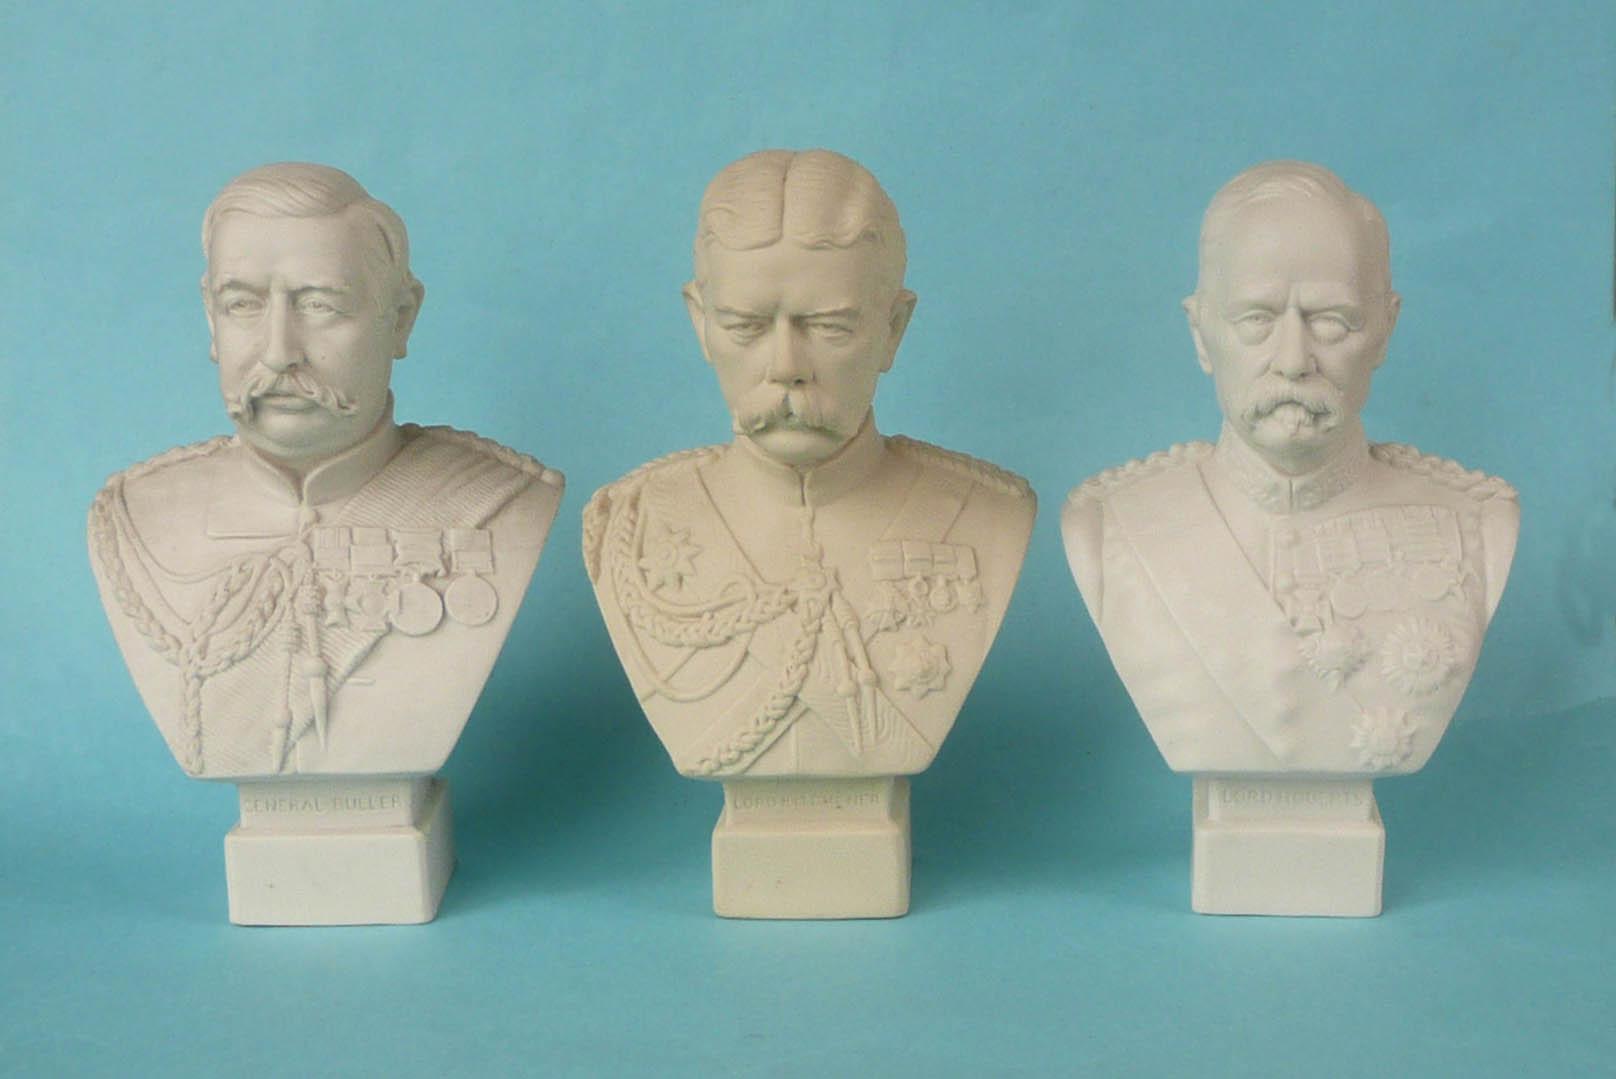 Lot 48 - 1900 Boer War: three white parian portrait busts by Robinson & Leadbeater modelled by W. C. Lawton